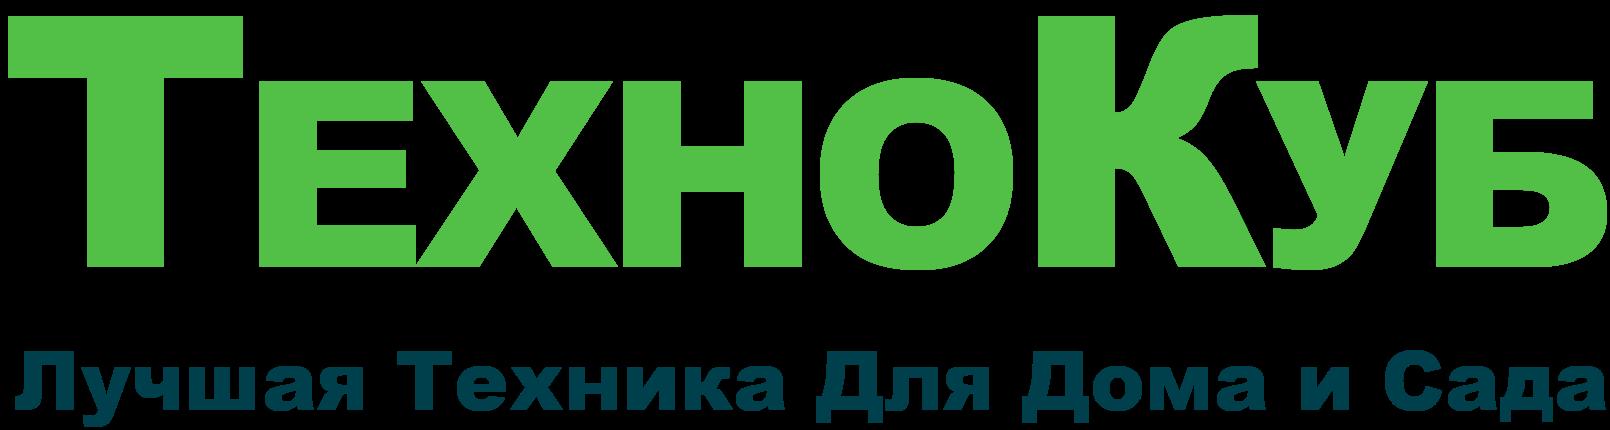 "Интернет магазин ""ТехноКуб"" 2004-2018"